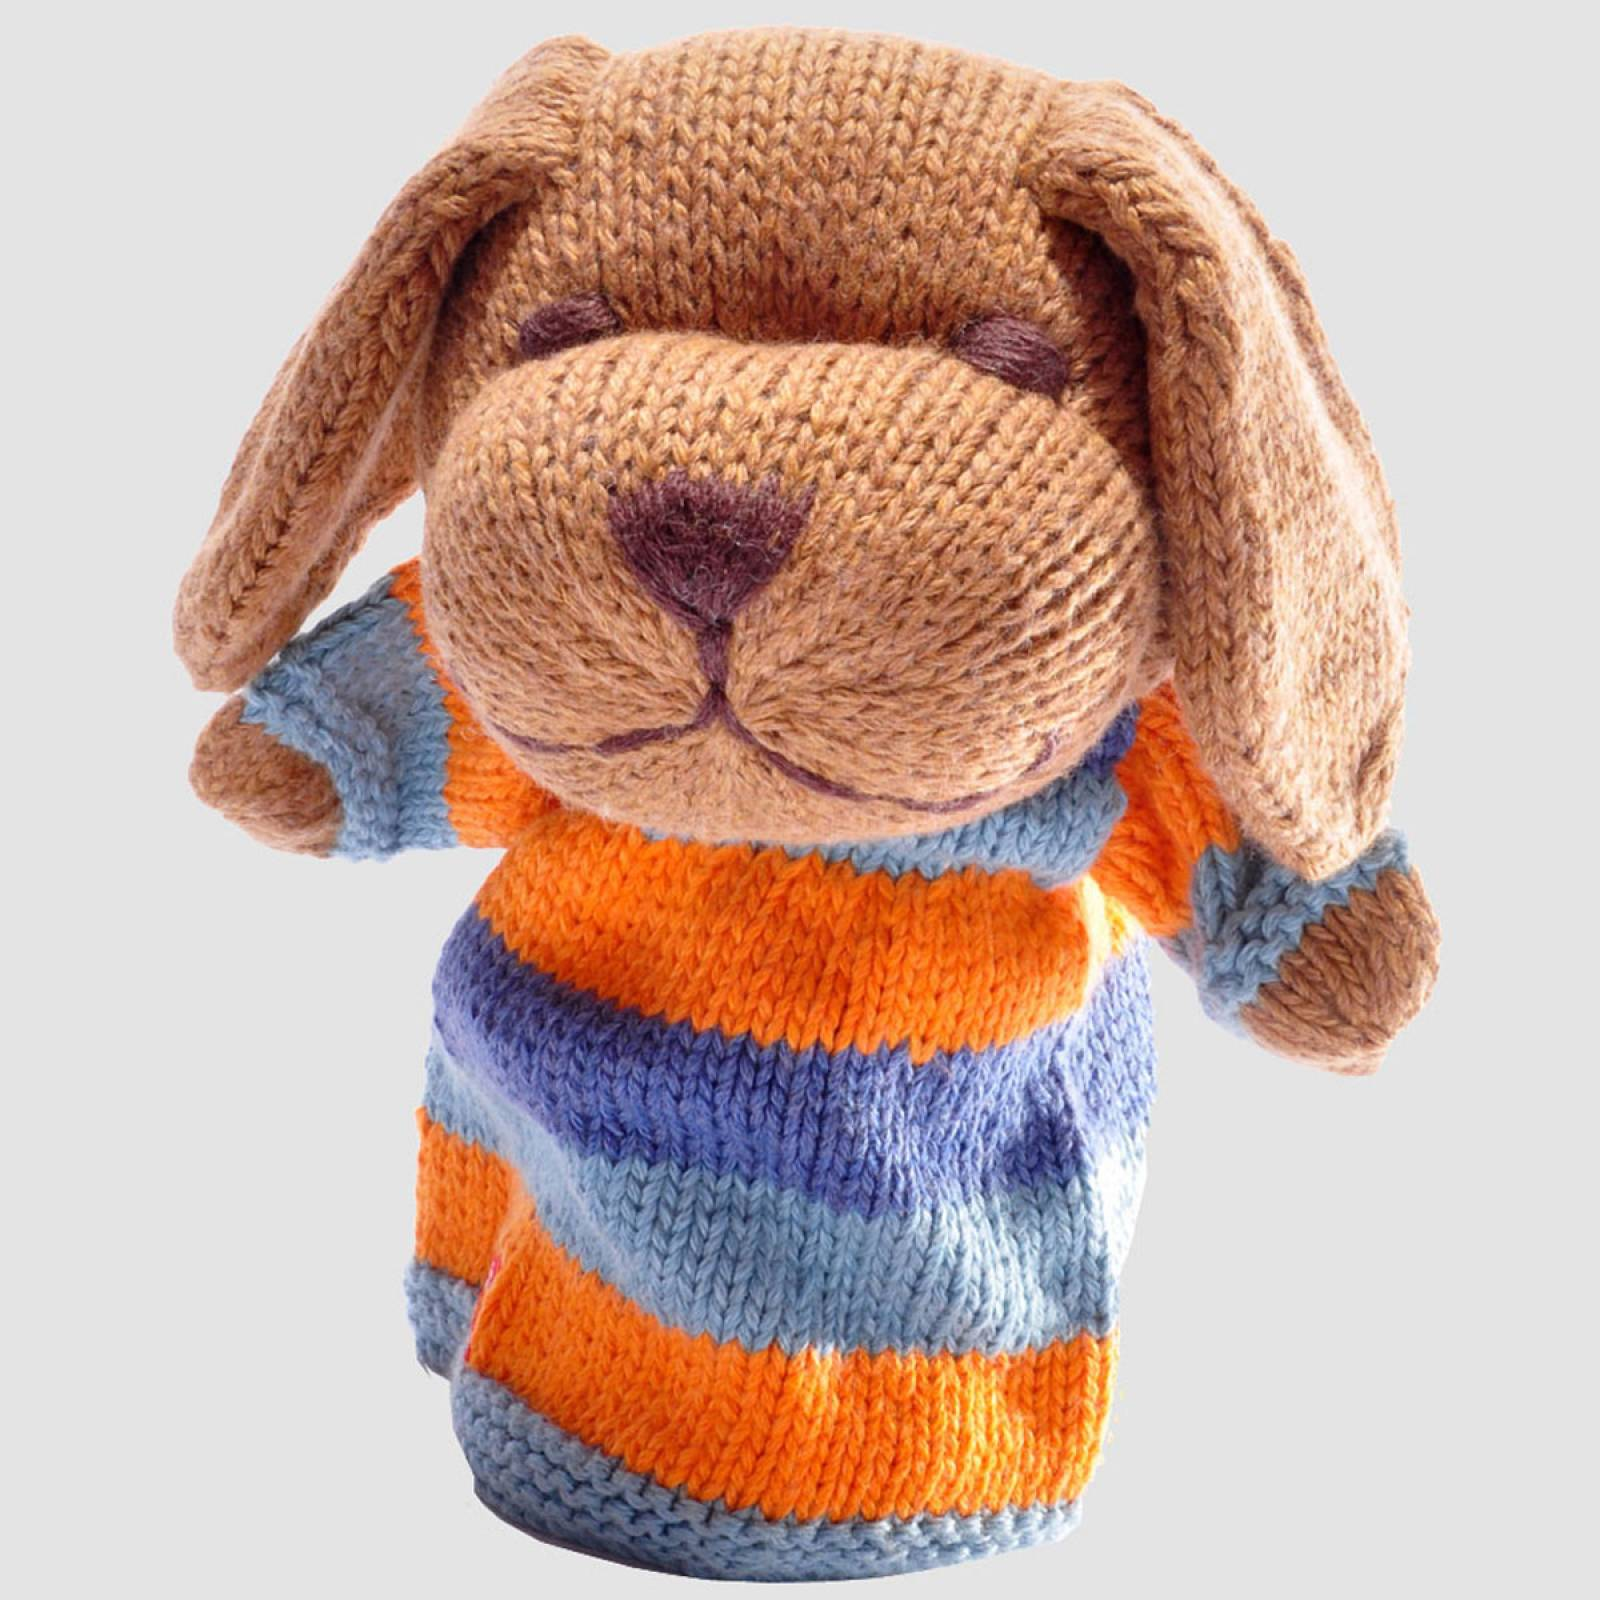 Dog - Blue Stripe Hand Knitted Glove Puppet Organic Cotton